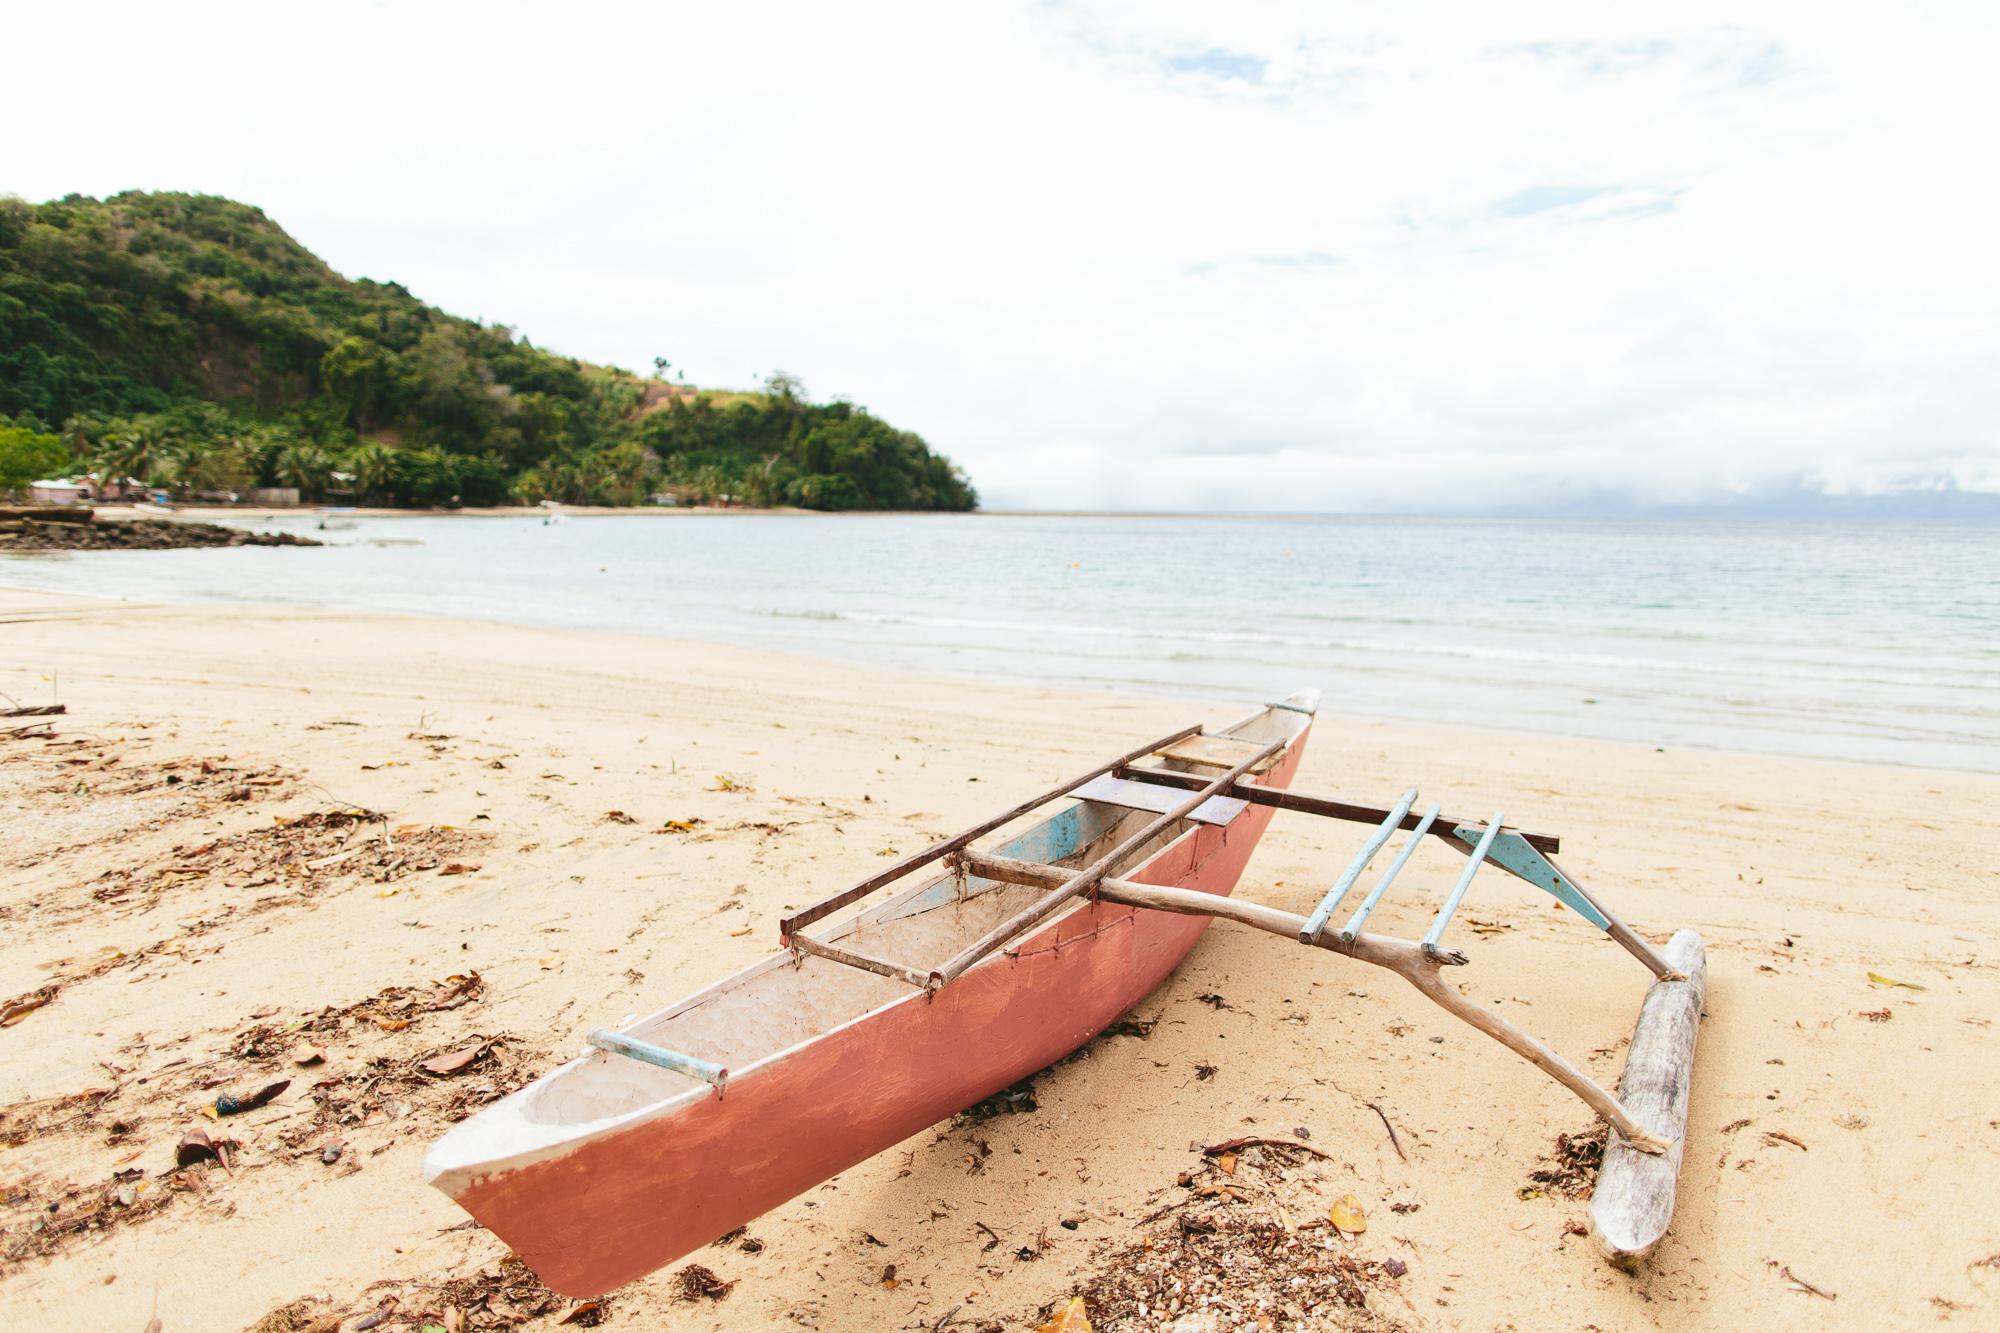 Dugout canoe on Kioa Island beach - The Remote Resort Fiji Islands